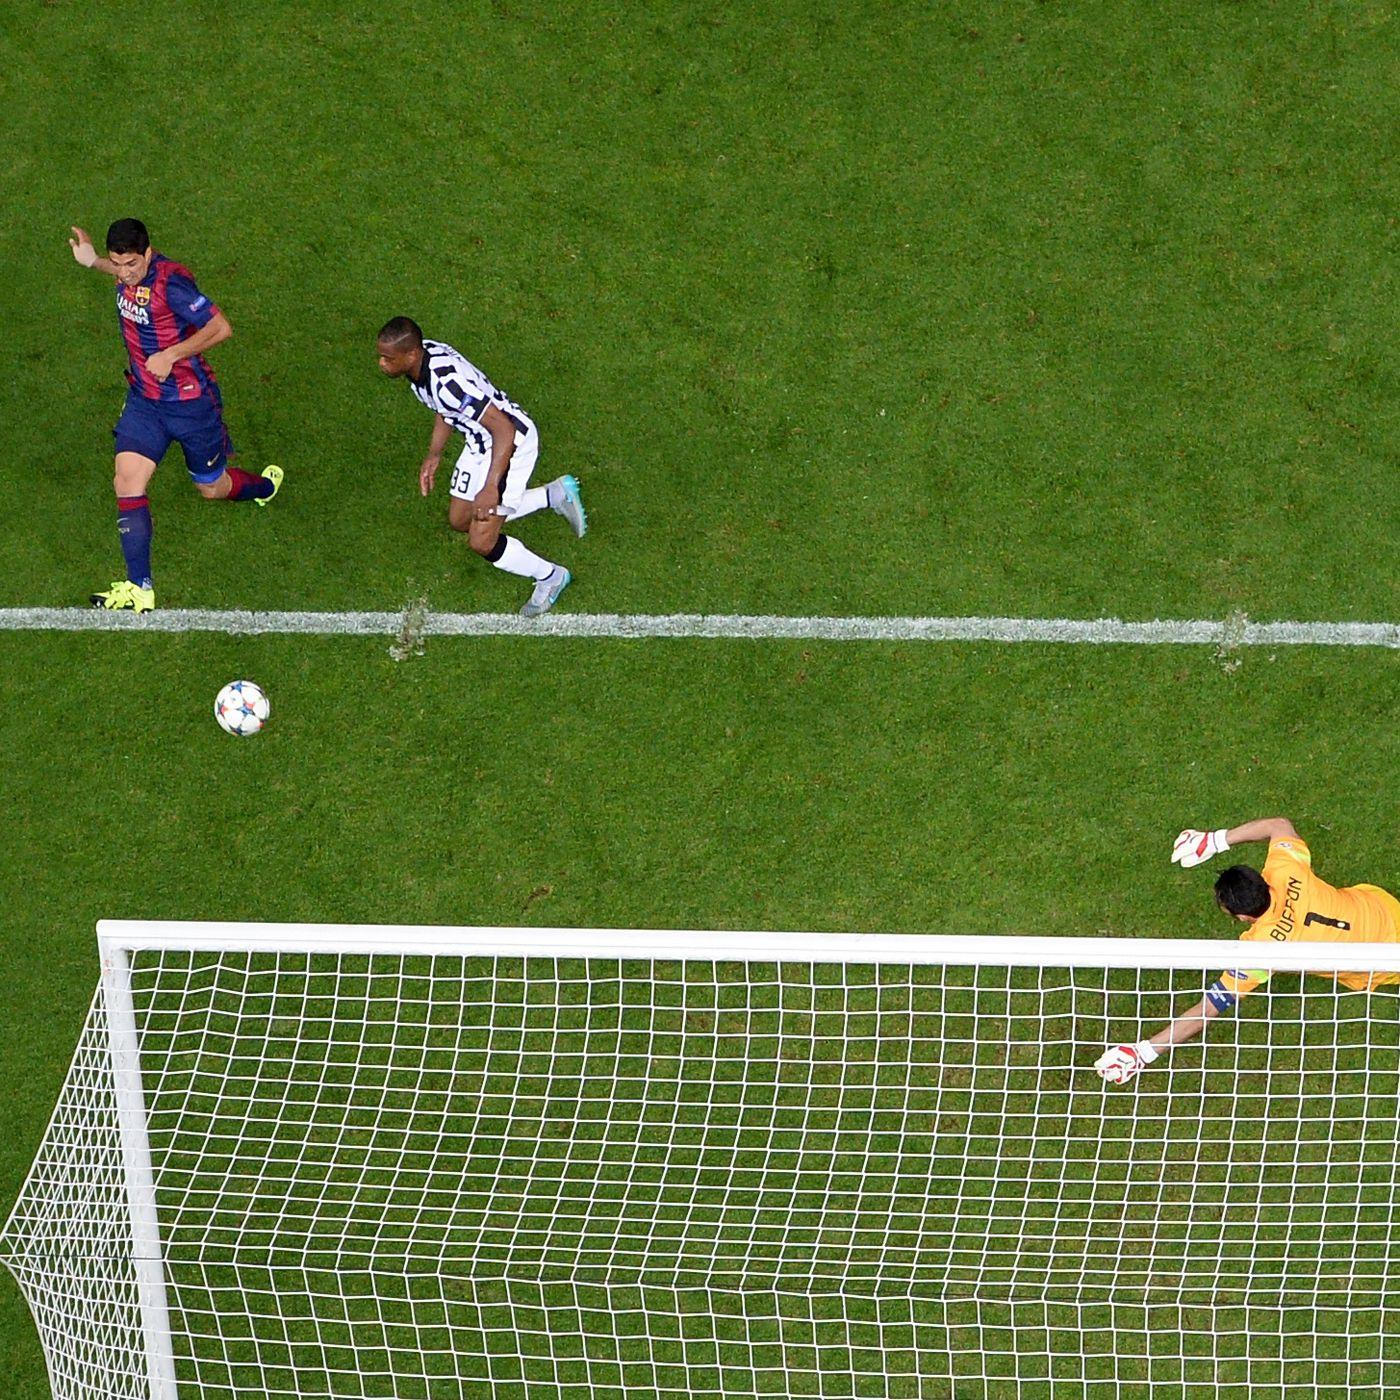 Uefa Champions League Final Juventus Fc 1 3 Fc Barcelona Player Ratings Barca Blaugranes